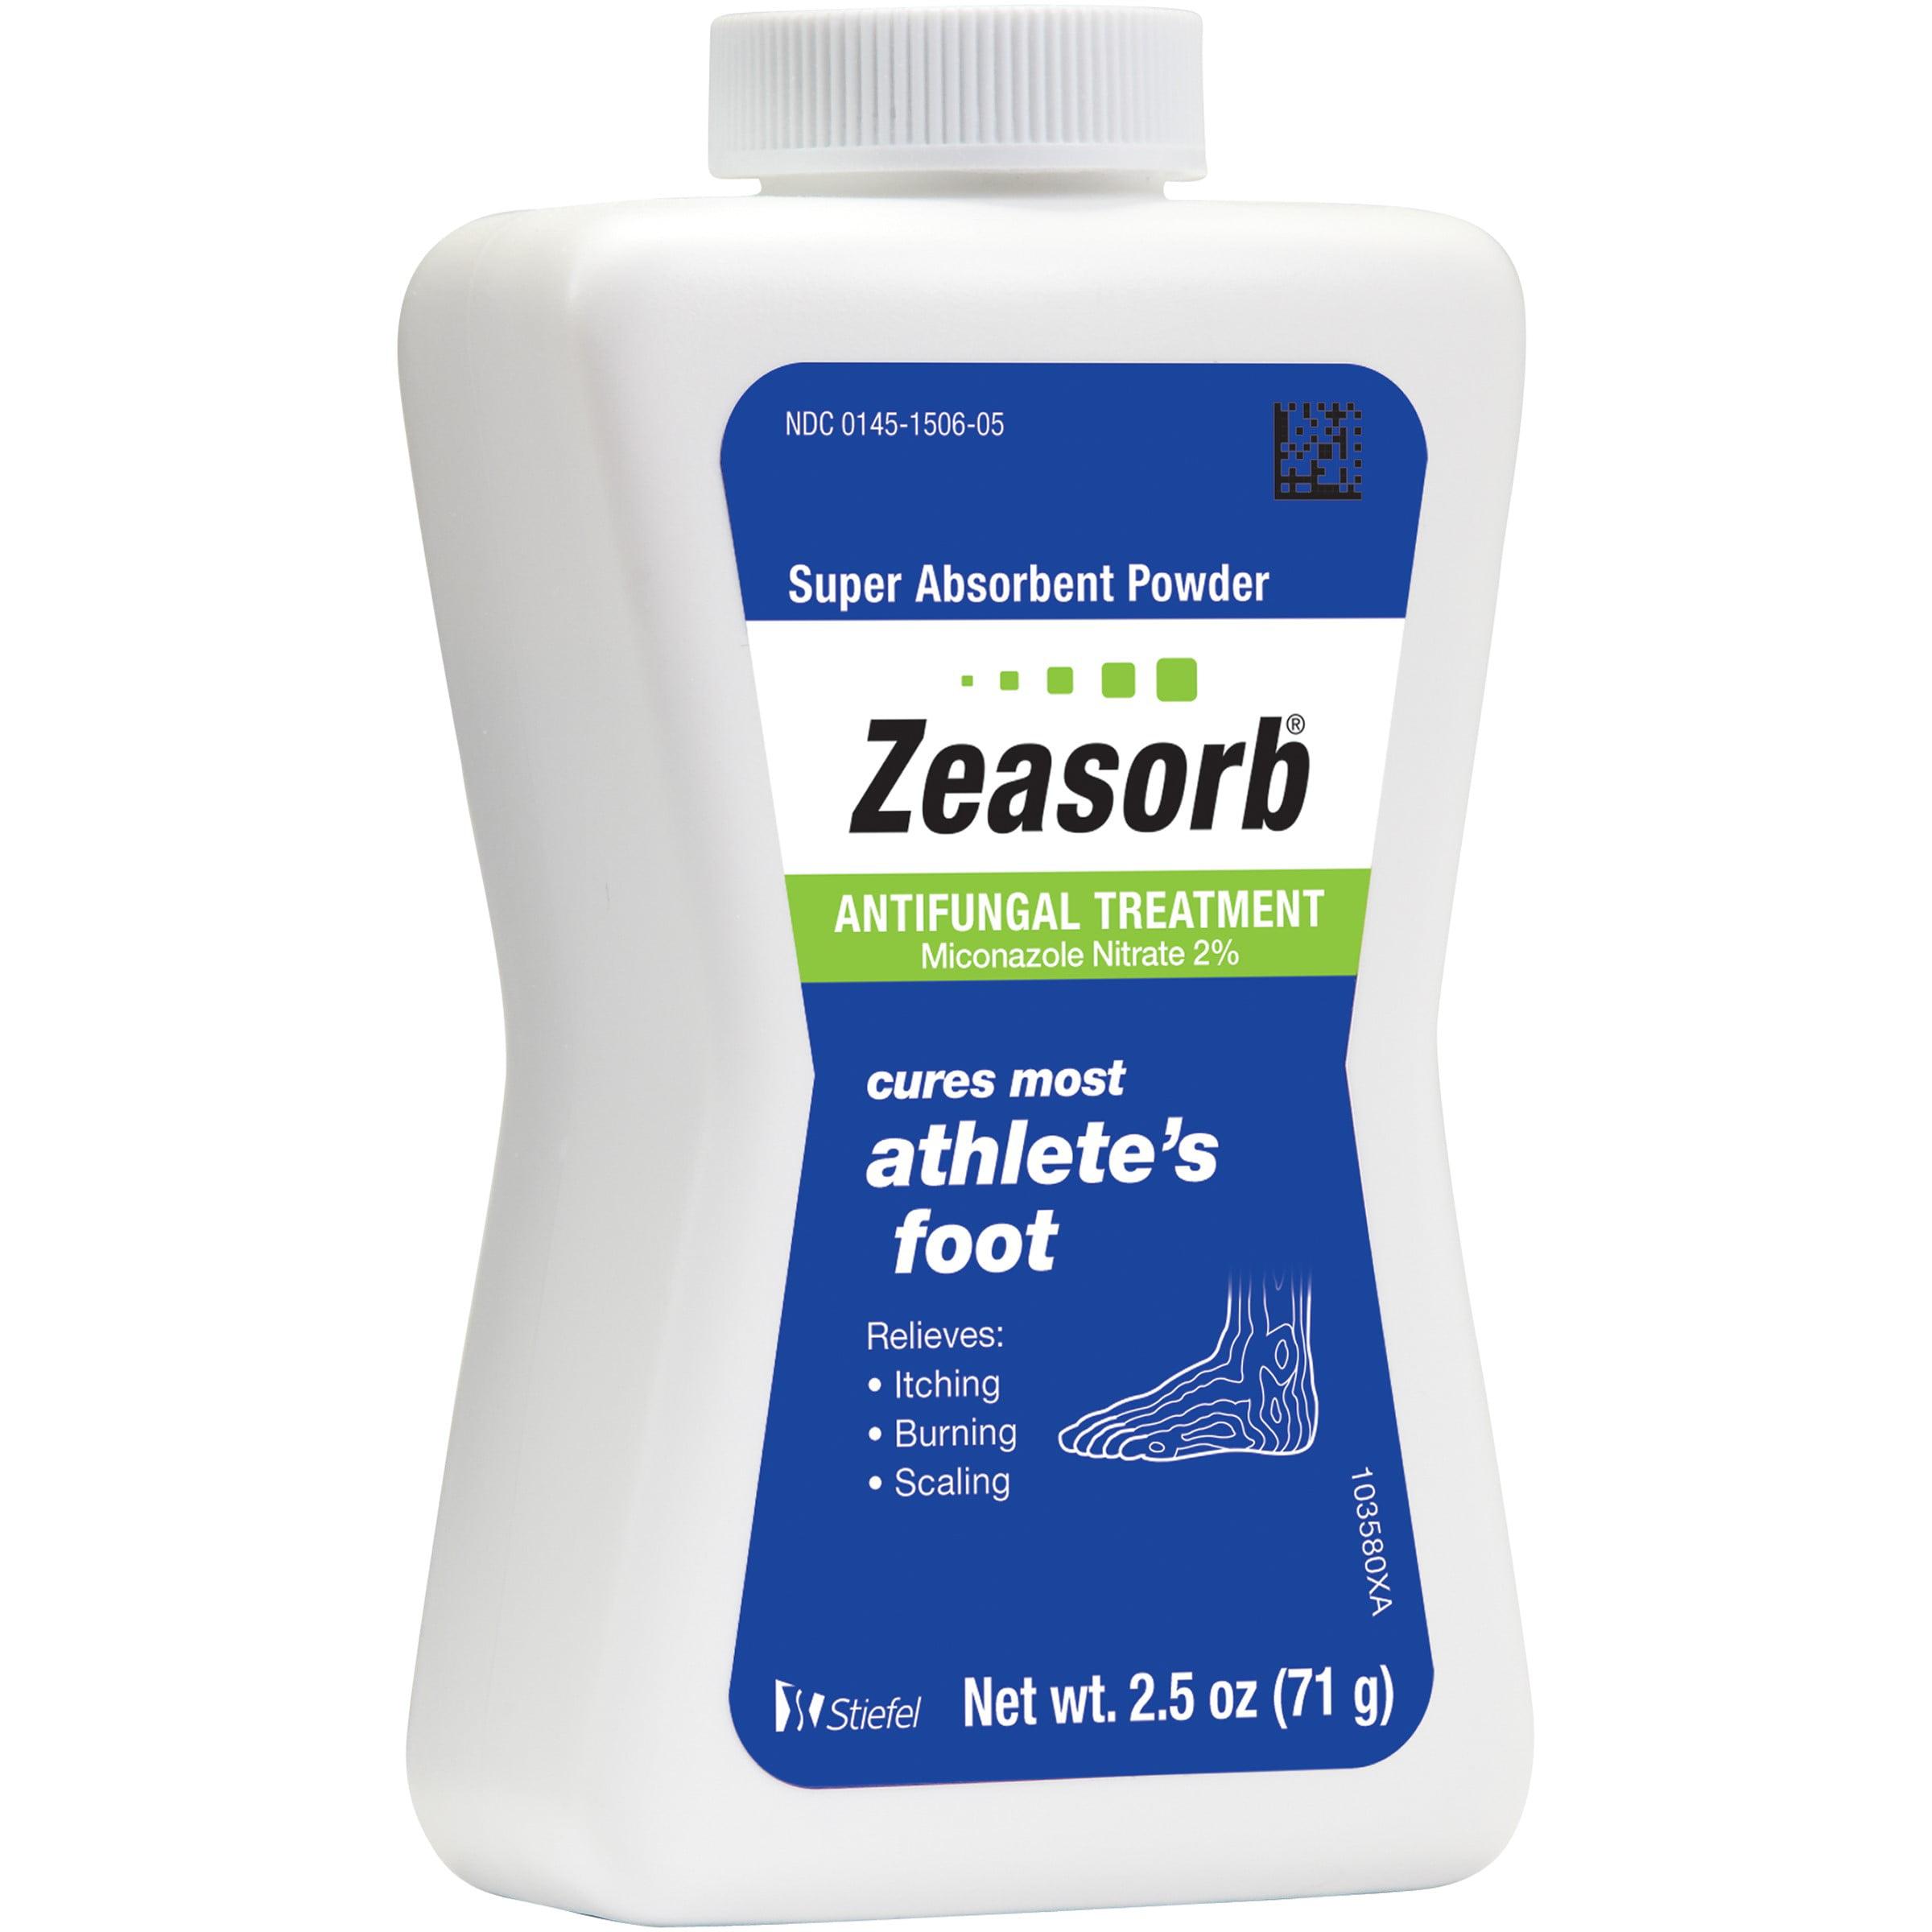 Zeasorb Athlete's Foot Antifungal Treatment Powder, Miconazole Nitrate 2%, 2.5 oz